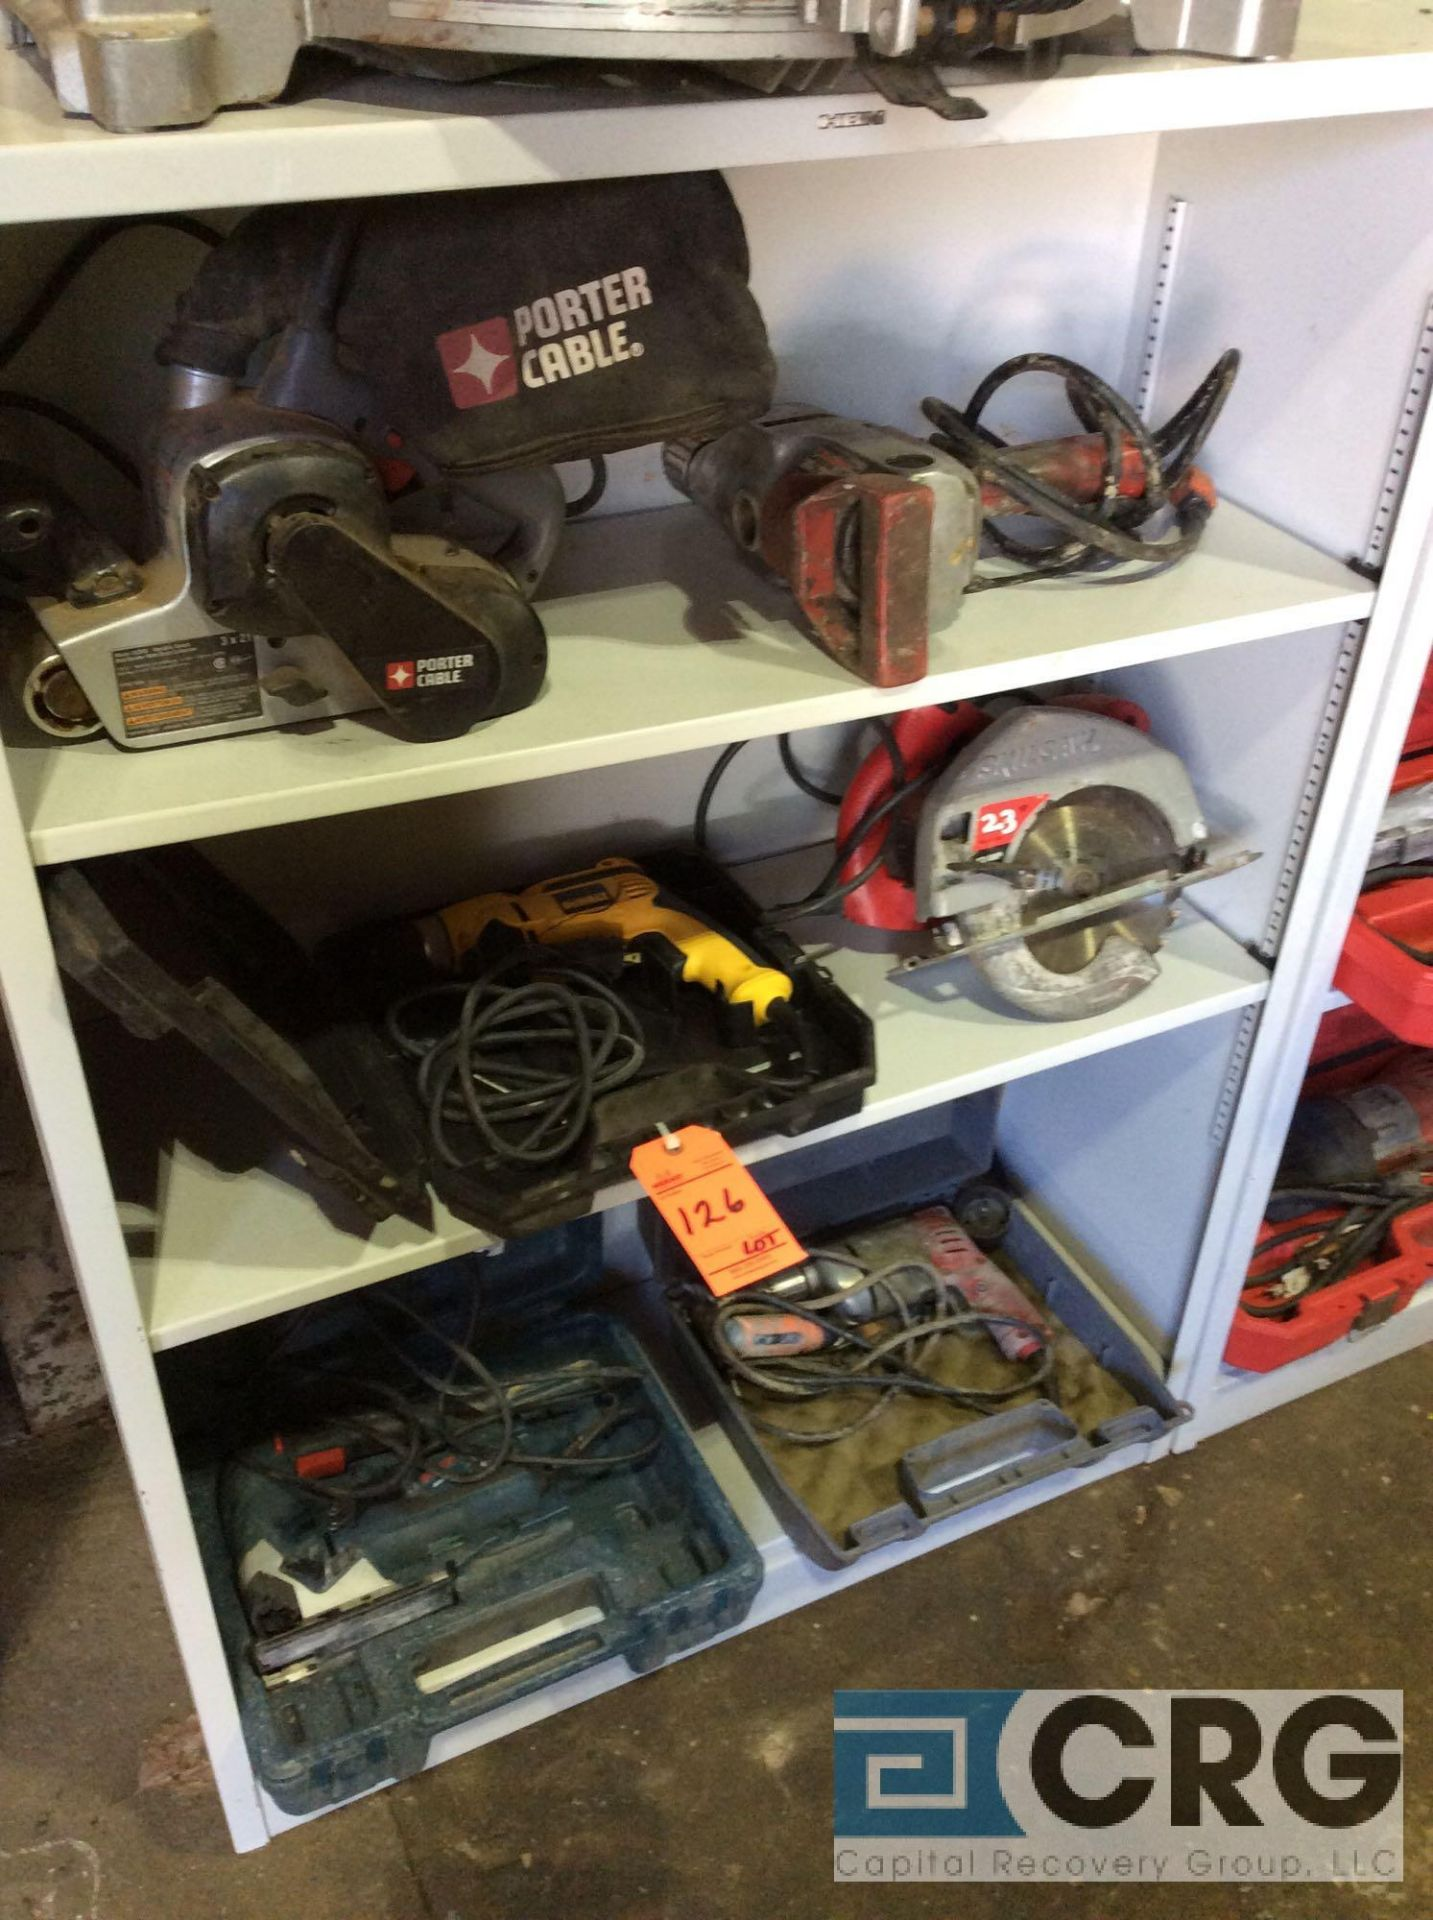 Lot 126 - Lot of asst hand tools including sawzalls, drills, circular saws, jig saws, belt sanders, etc (